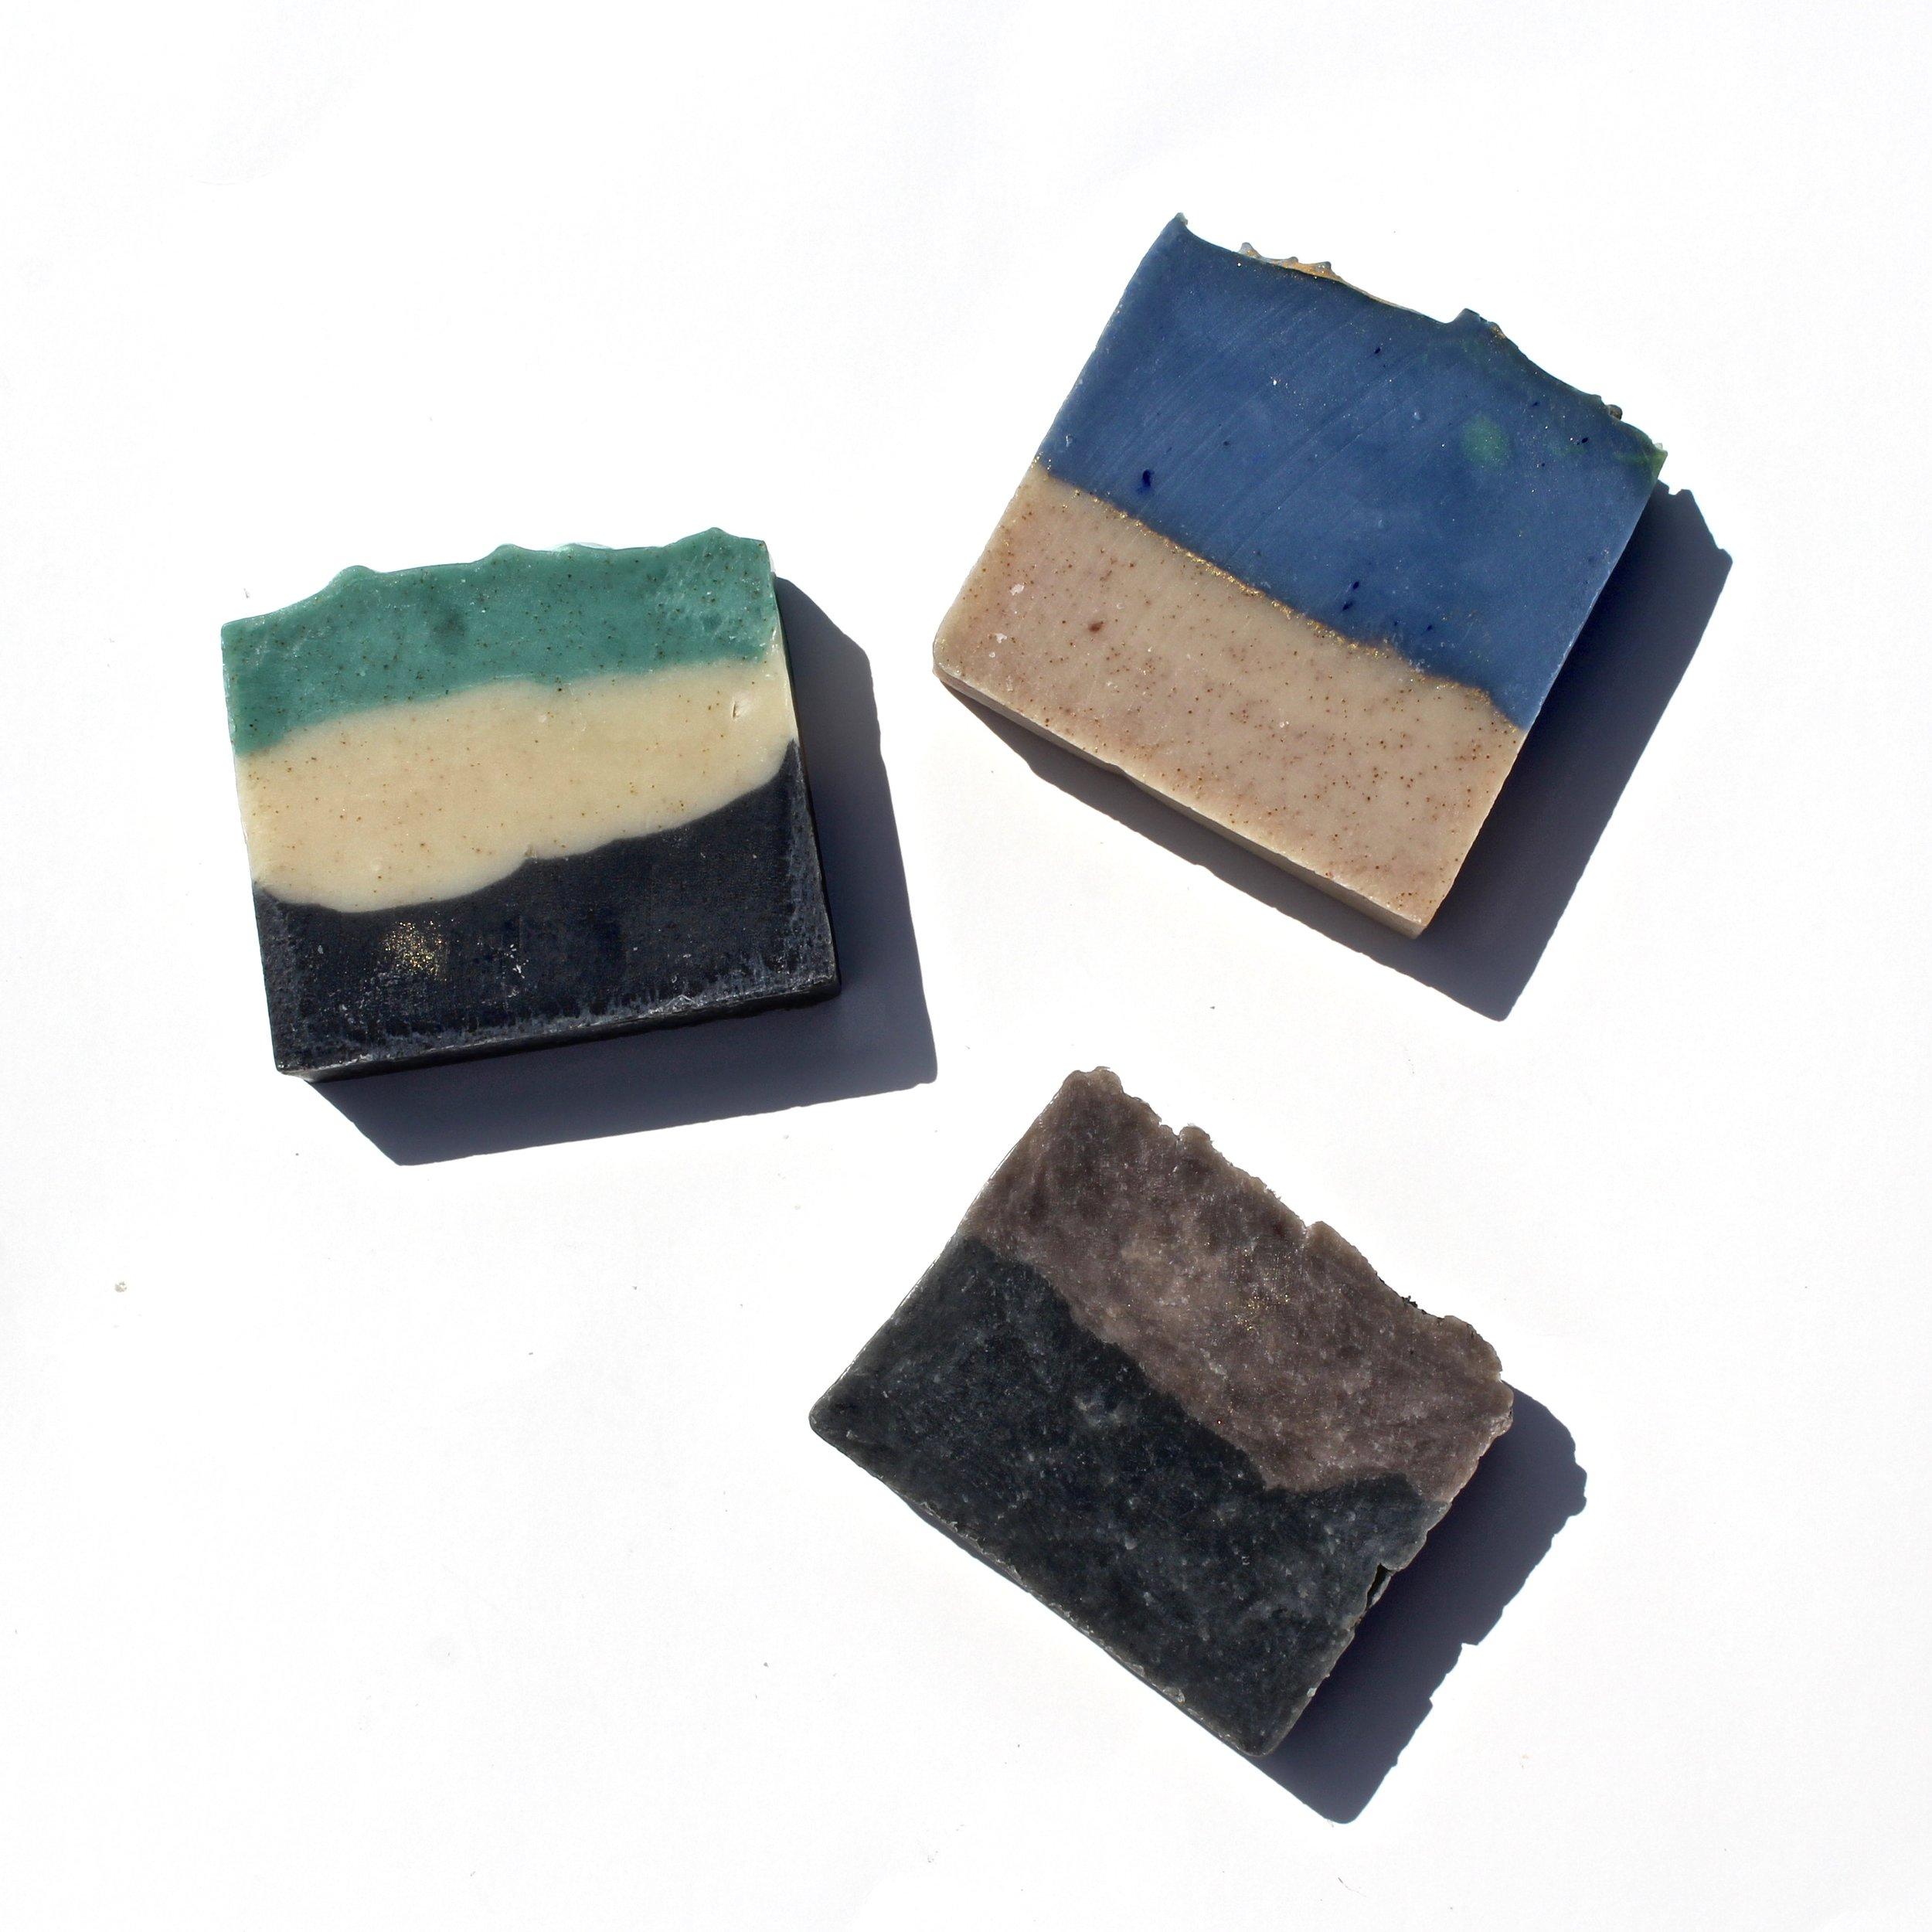 Woodsman Scrub, Island Escape & Tobacco-Bay Leaf Shave soaps make excellent ecofriendly gifts!